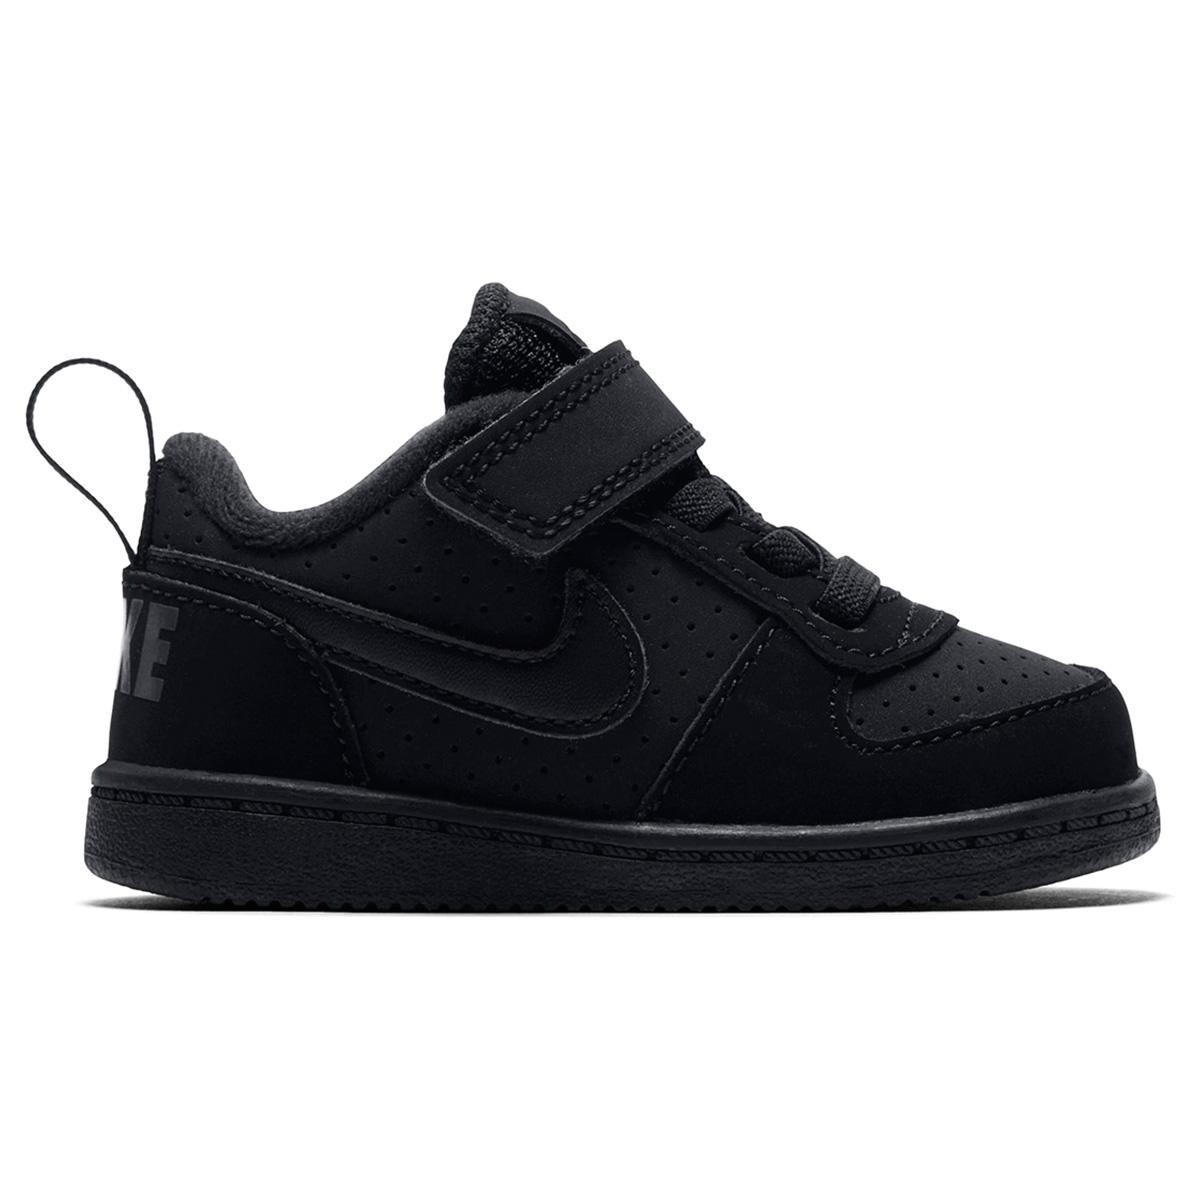 b29f5ec0052 Tênis Infantil Nike Court Borough Low Masculino - Preto - Compre Agora